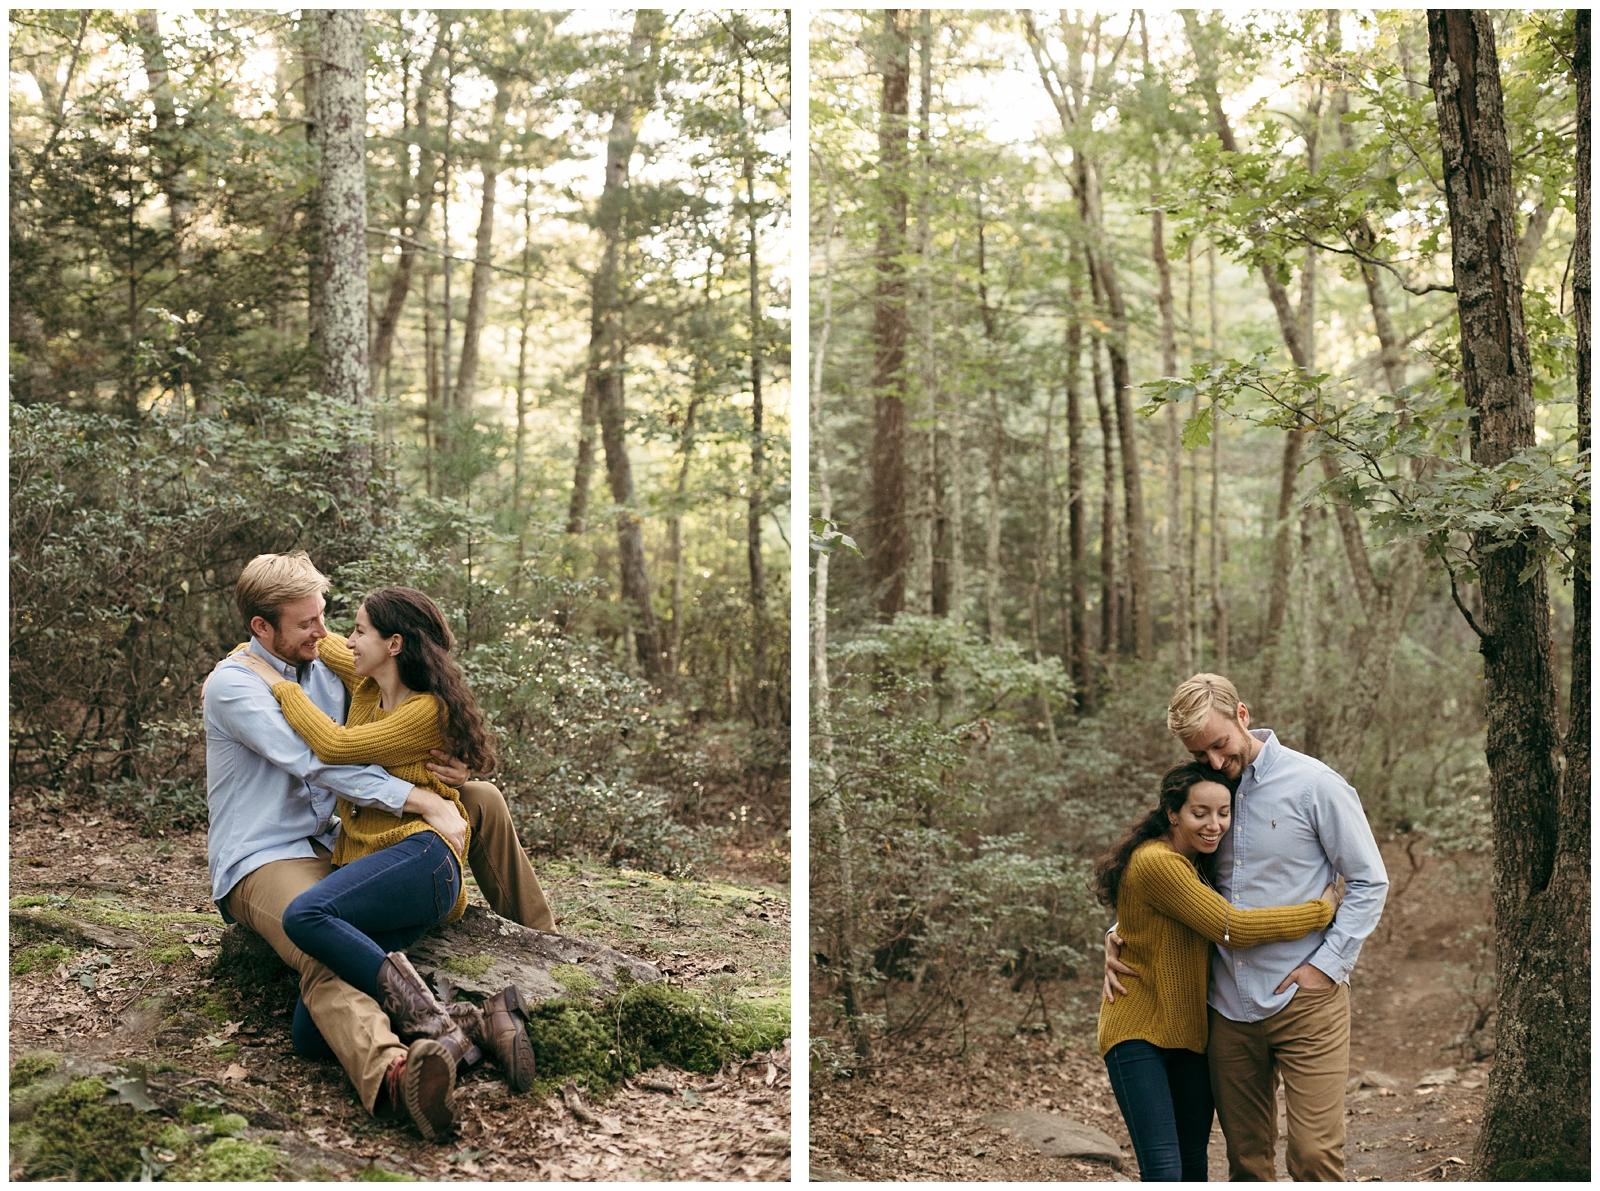 Connecticut-Engagement-Photographer-Bailey-Q-Photo-17.jpg